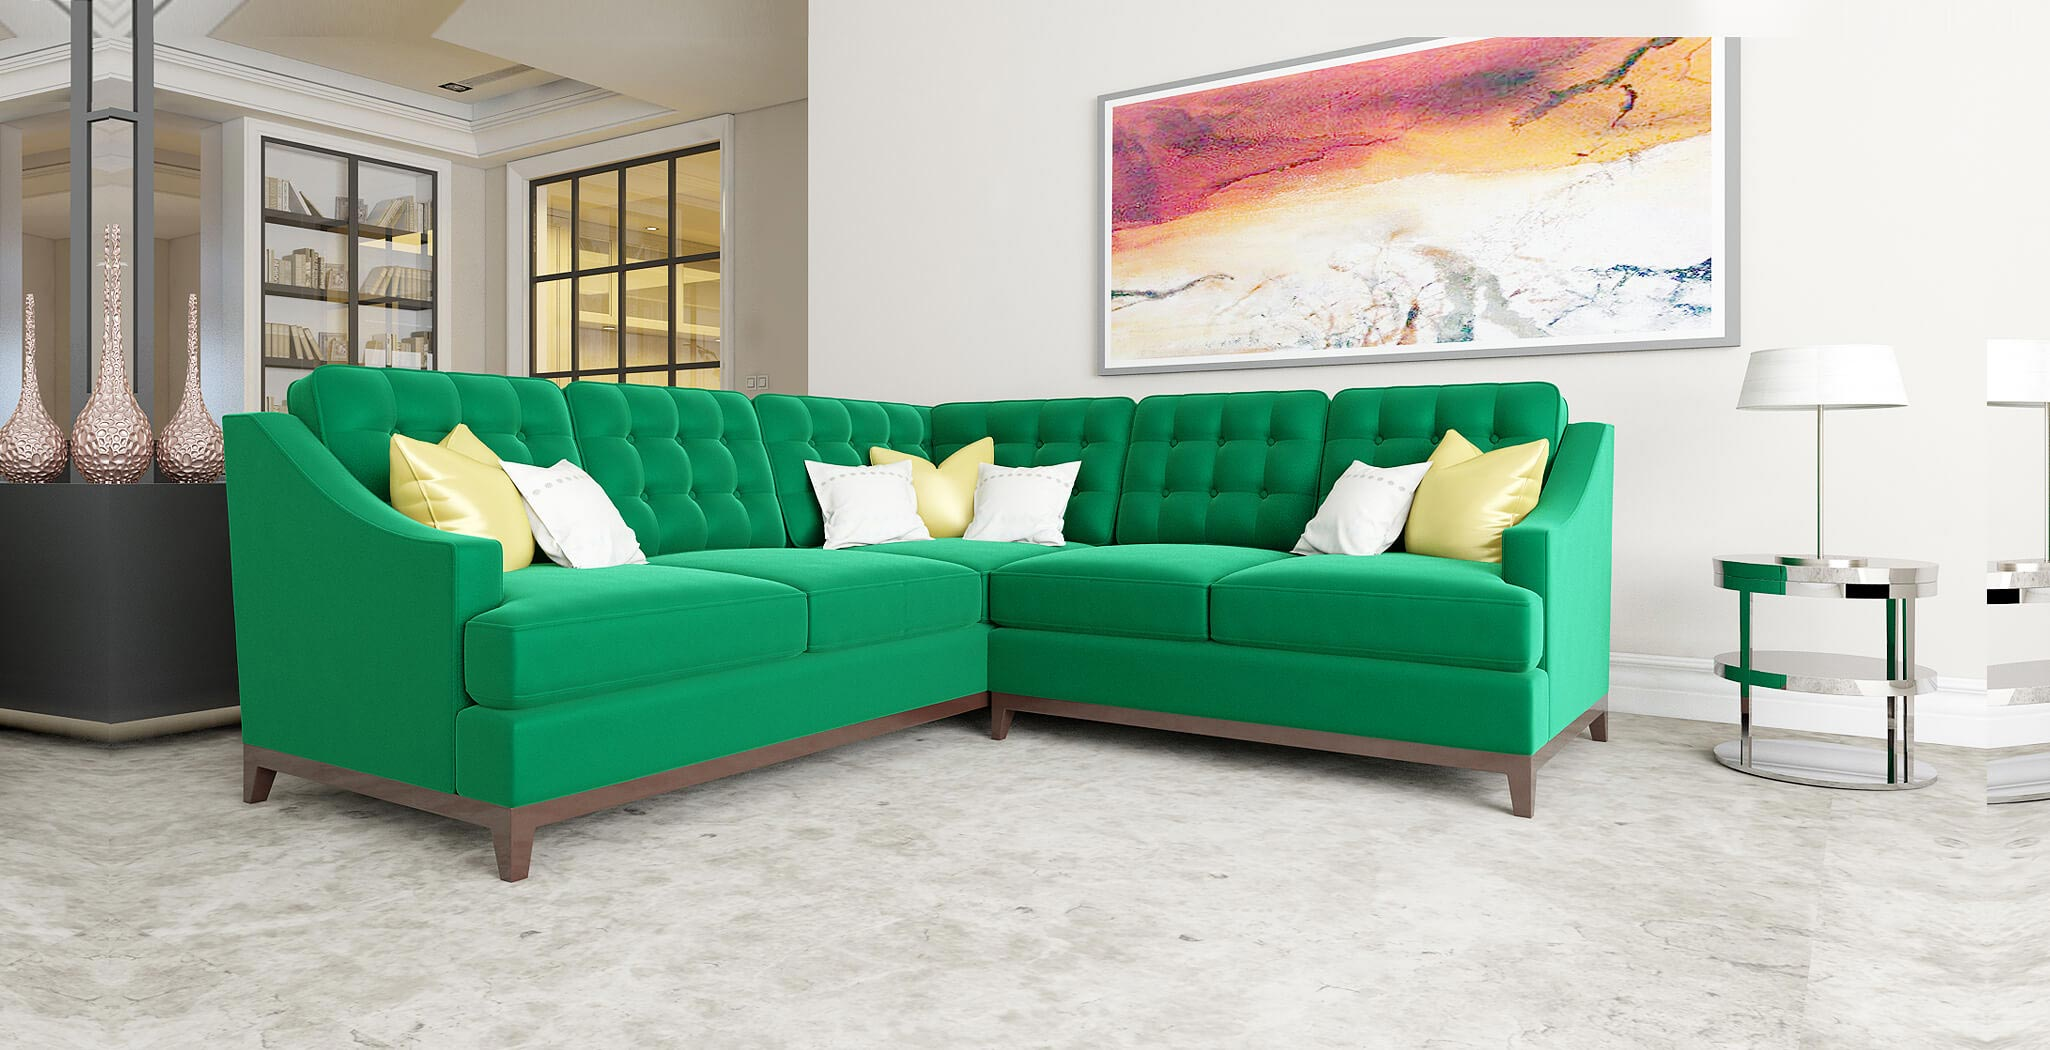 geneva sectional furniture gallery 5